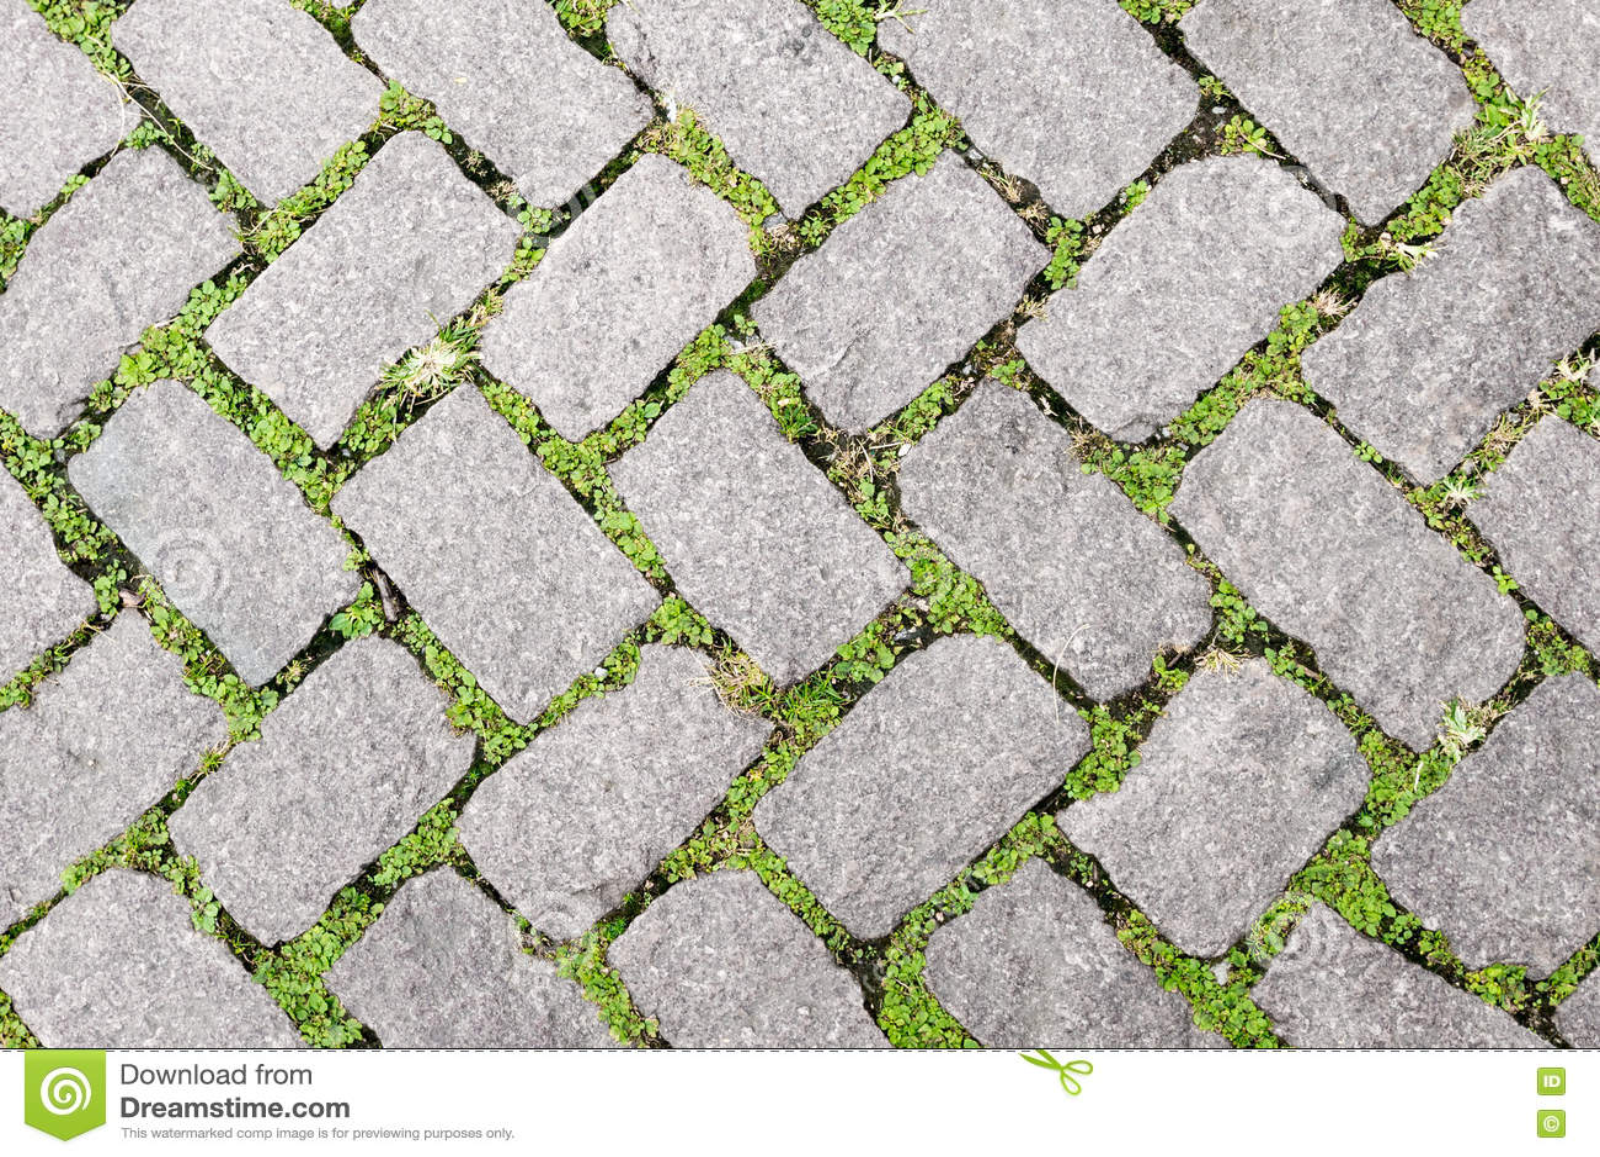 grass stone floor texture pavement design stock image image of